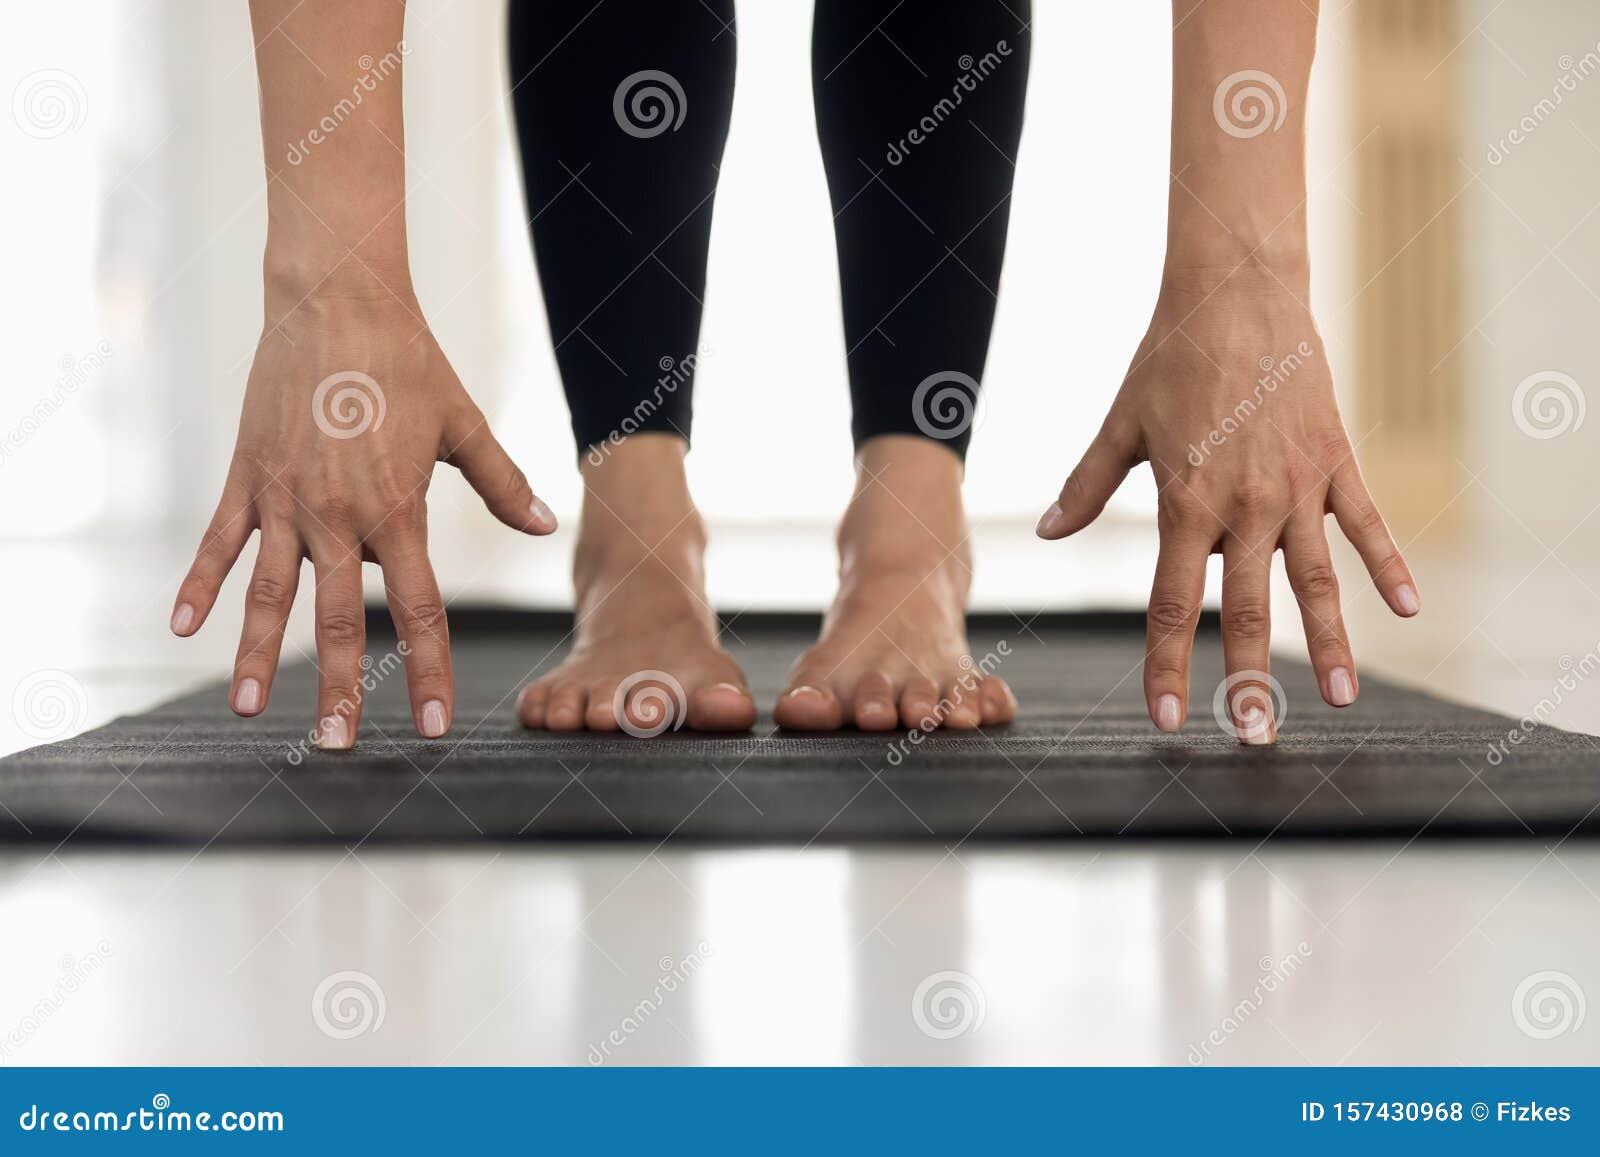 50,5027 Yoga Feet Photos   Free & Royalty Free Stock Photos from ...